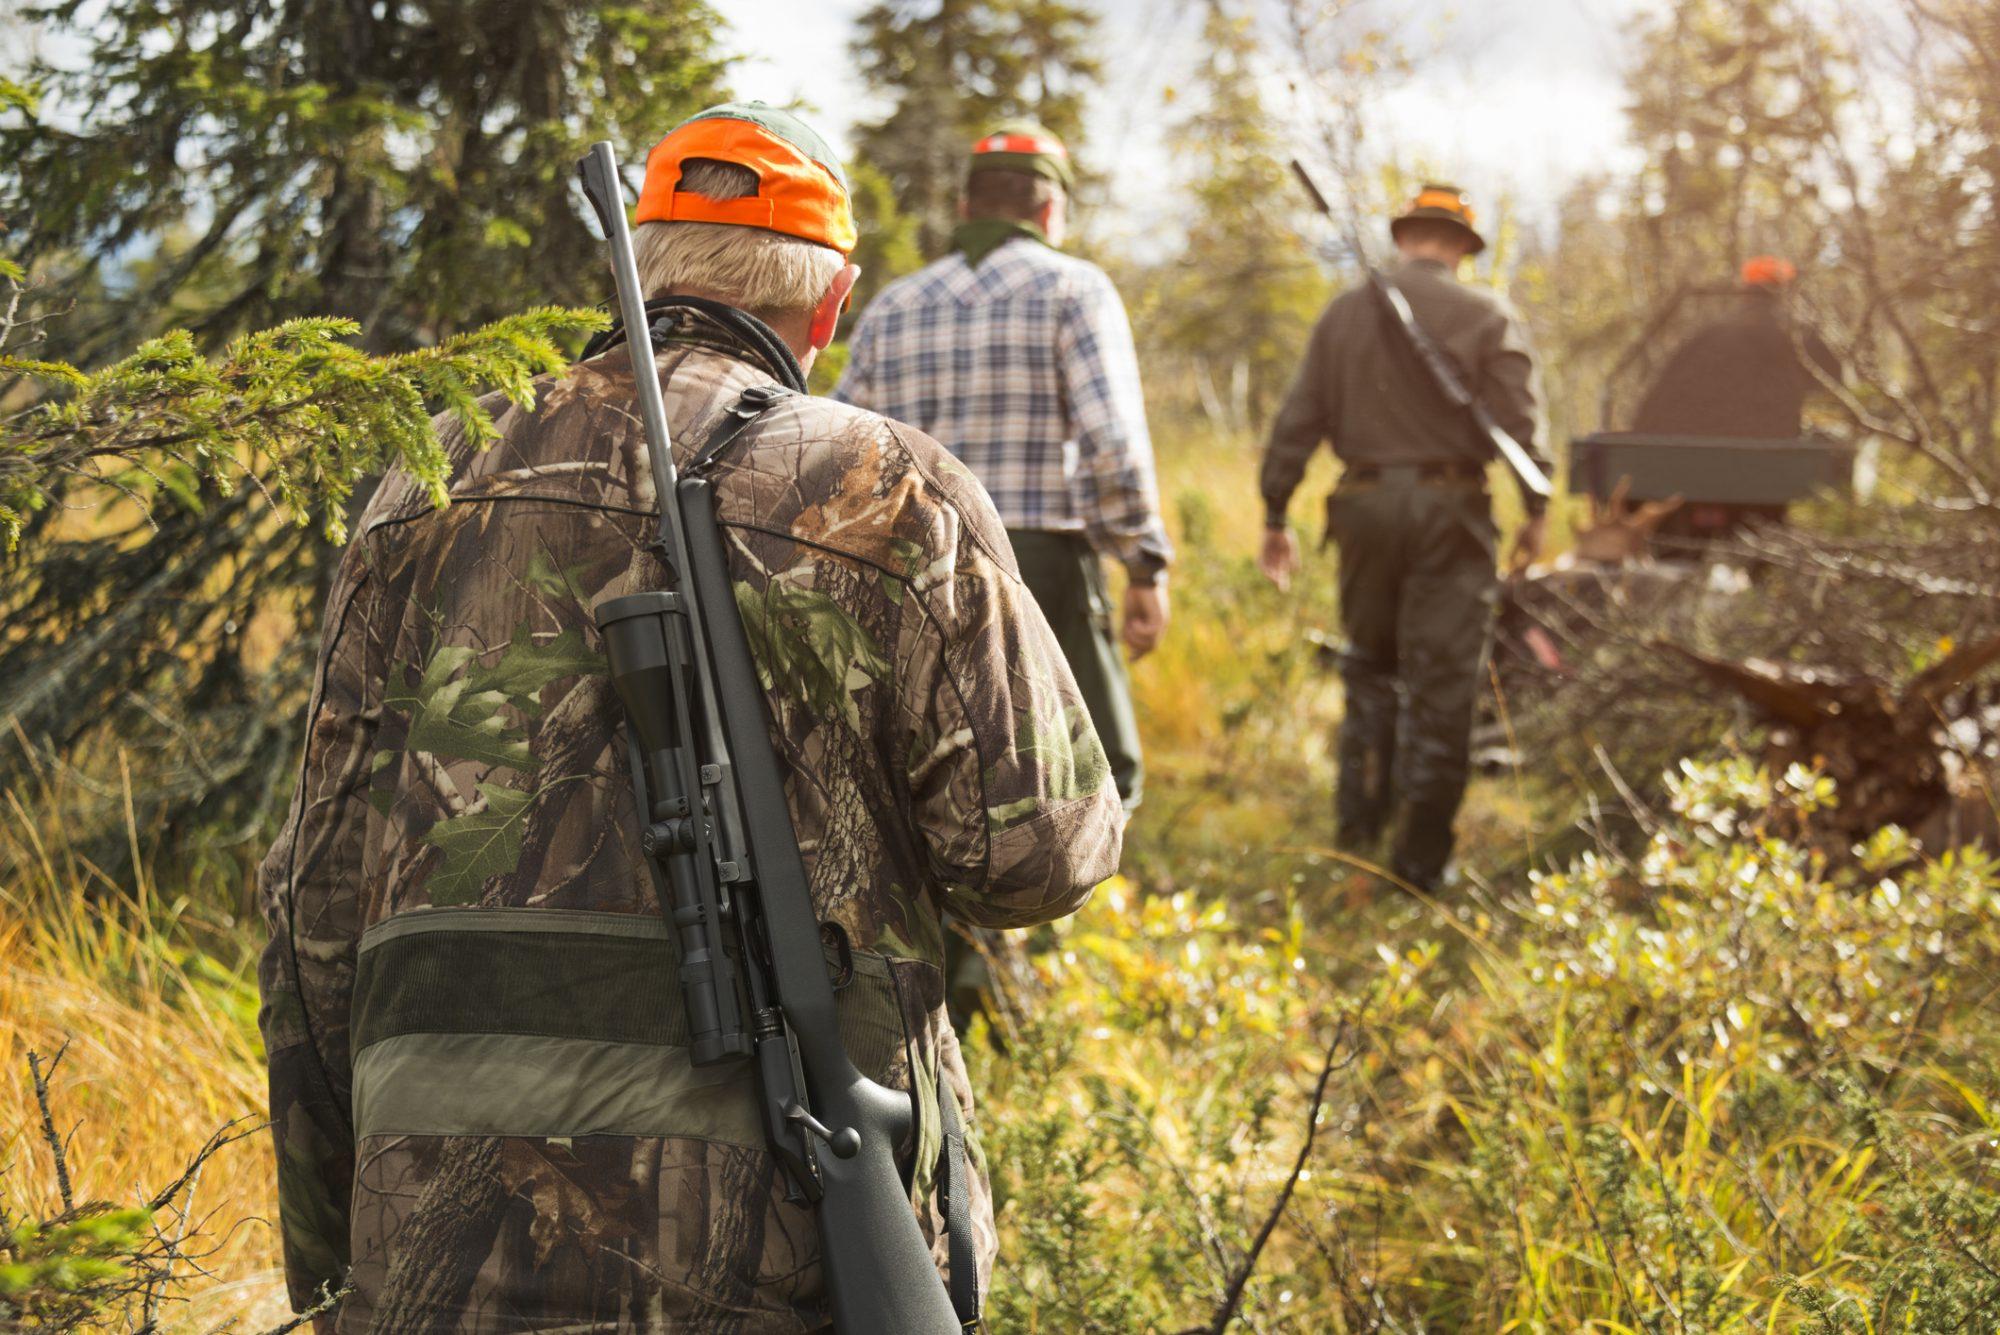 Айсен Николаев подписал указ о запрете охоты до снятия режима ЧС в Якутии